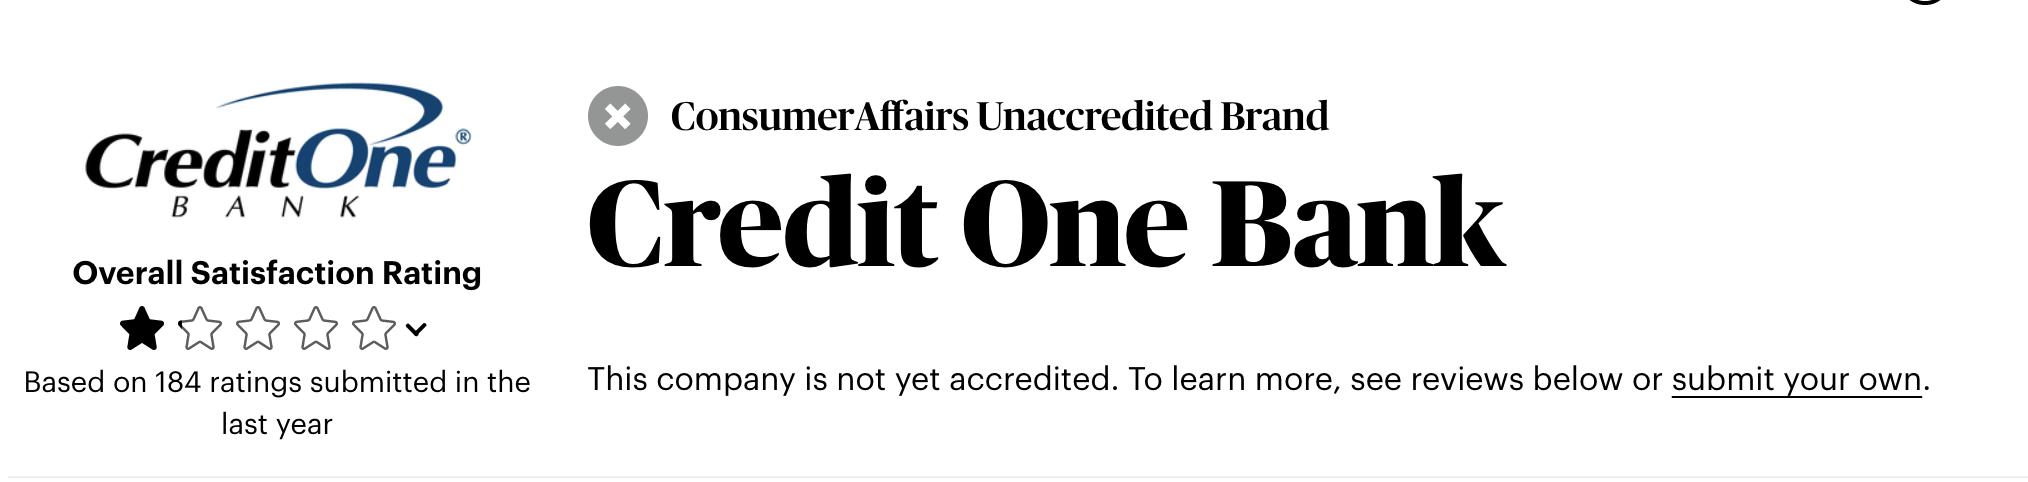 Credit One Bank customer service